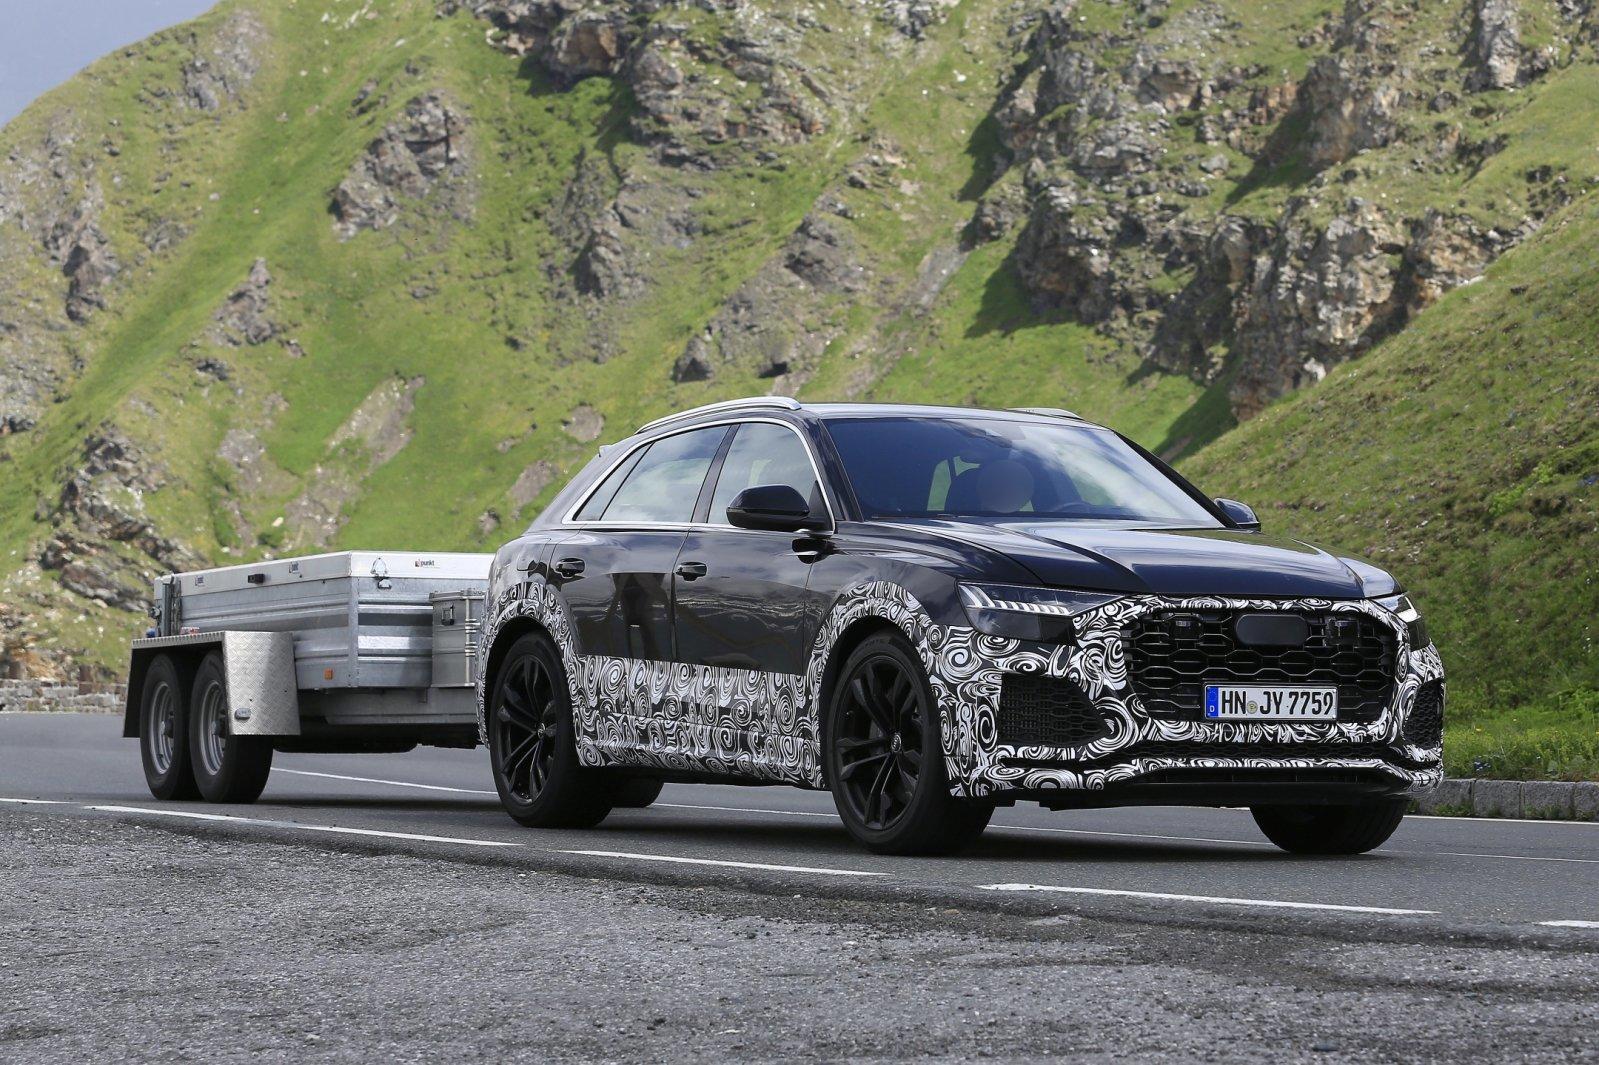 Audi RS Q8 - Poze spion - Audi RS Q8 - Poze spion